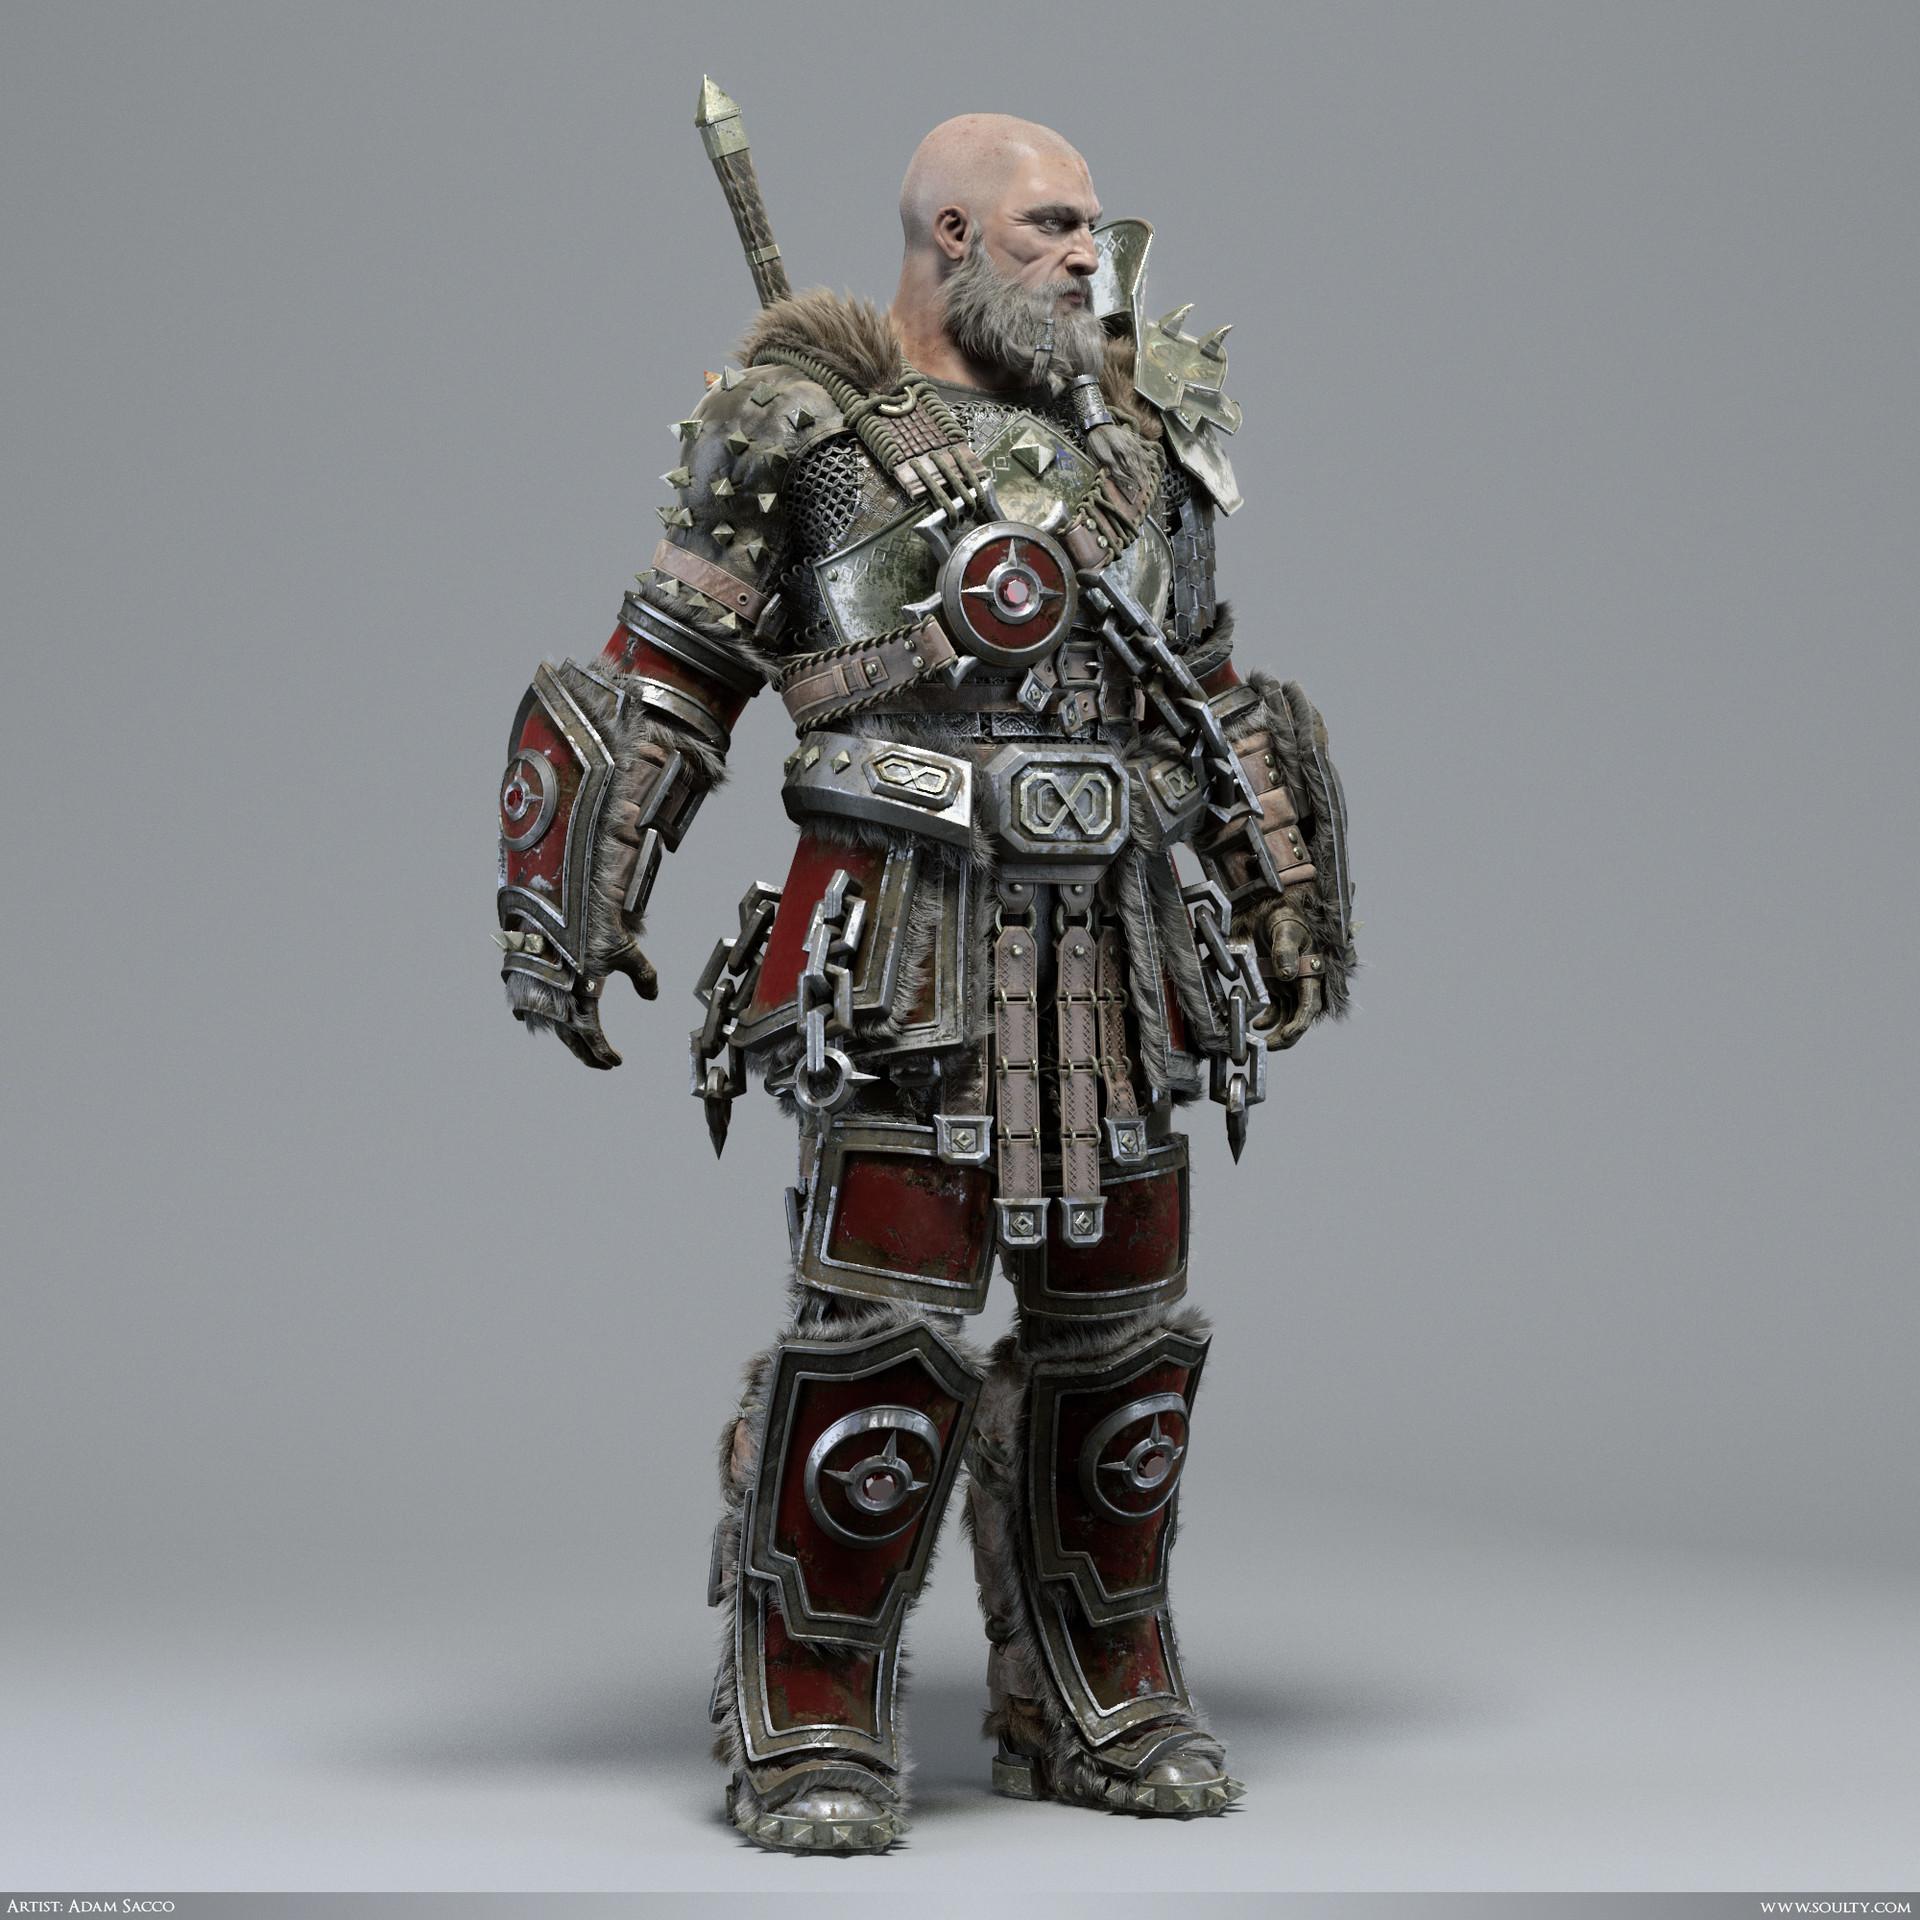 Adam sacco archaic warrior 2